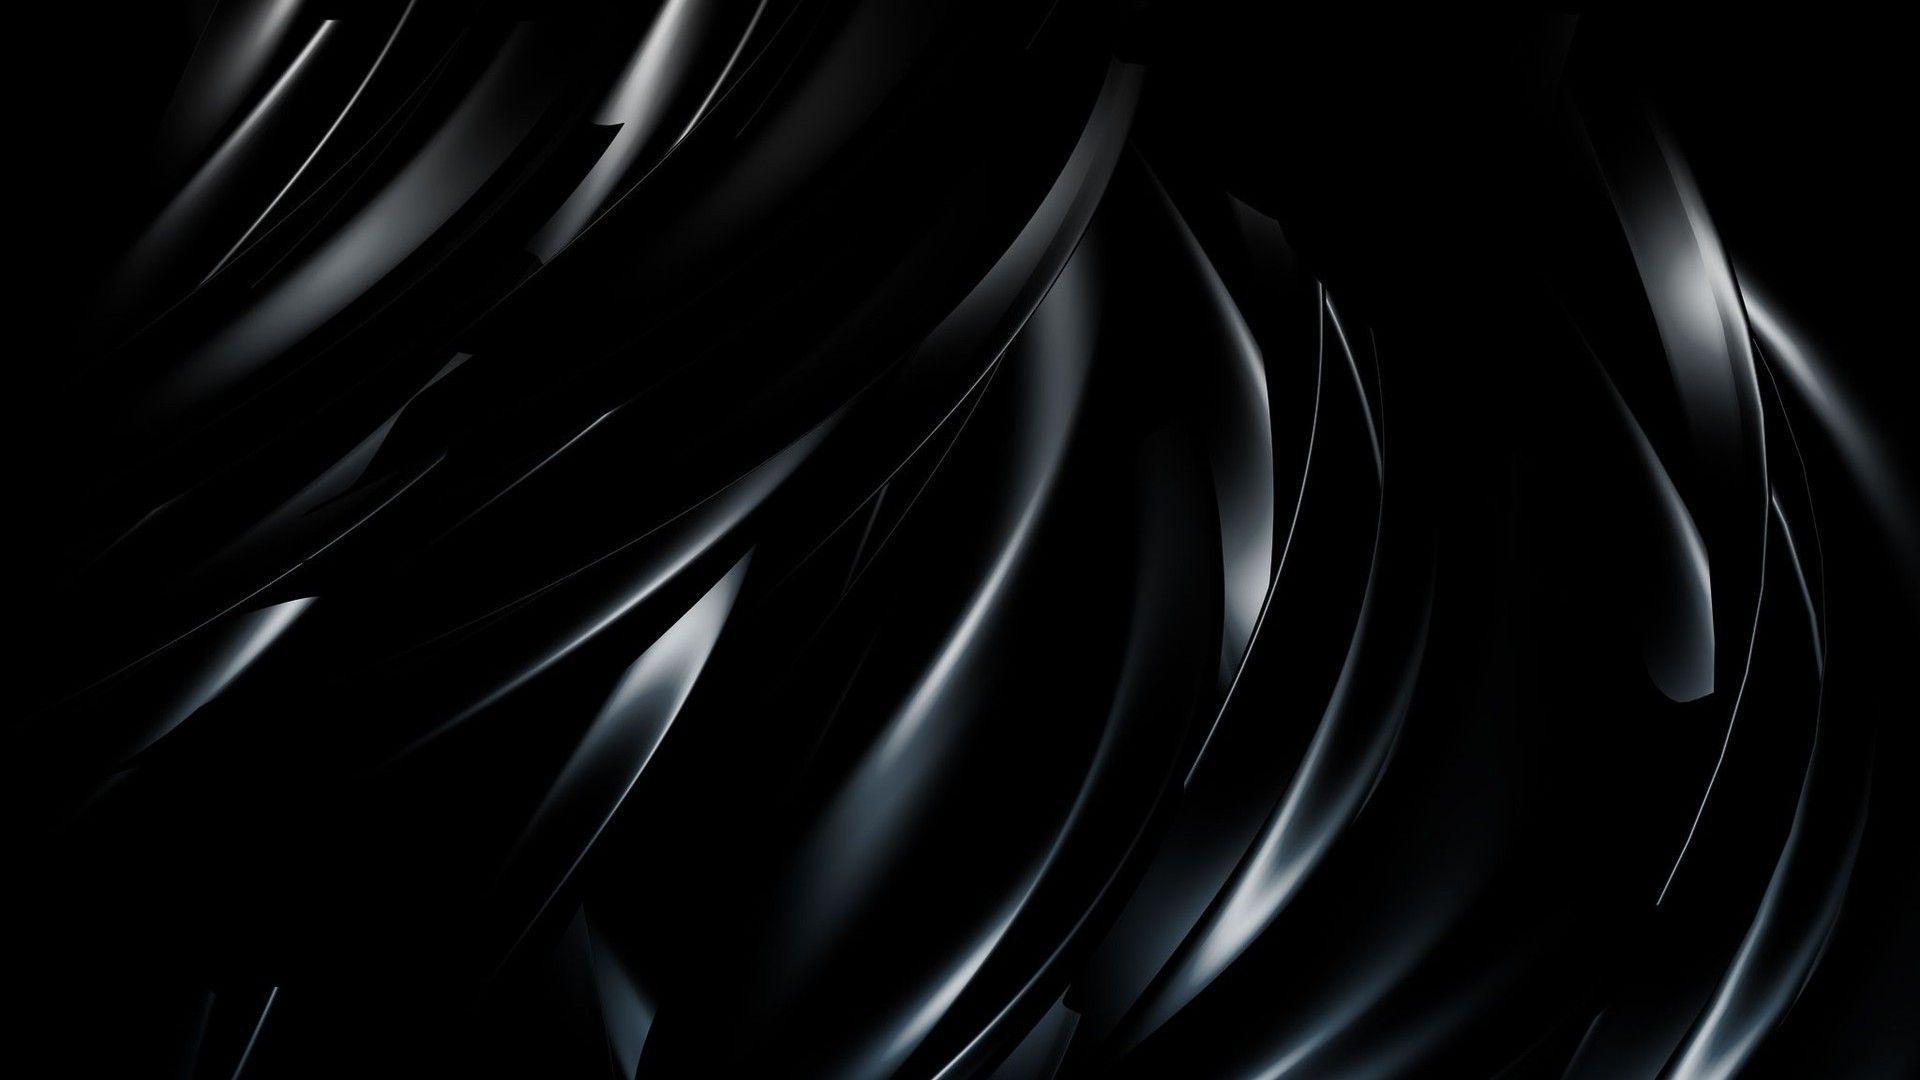 Black Abstract Wallpaper Hd 1080P 11 HD Wallpapers | lzamgs.